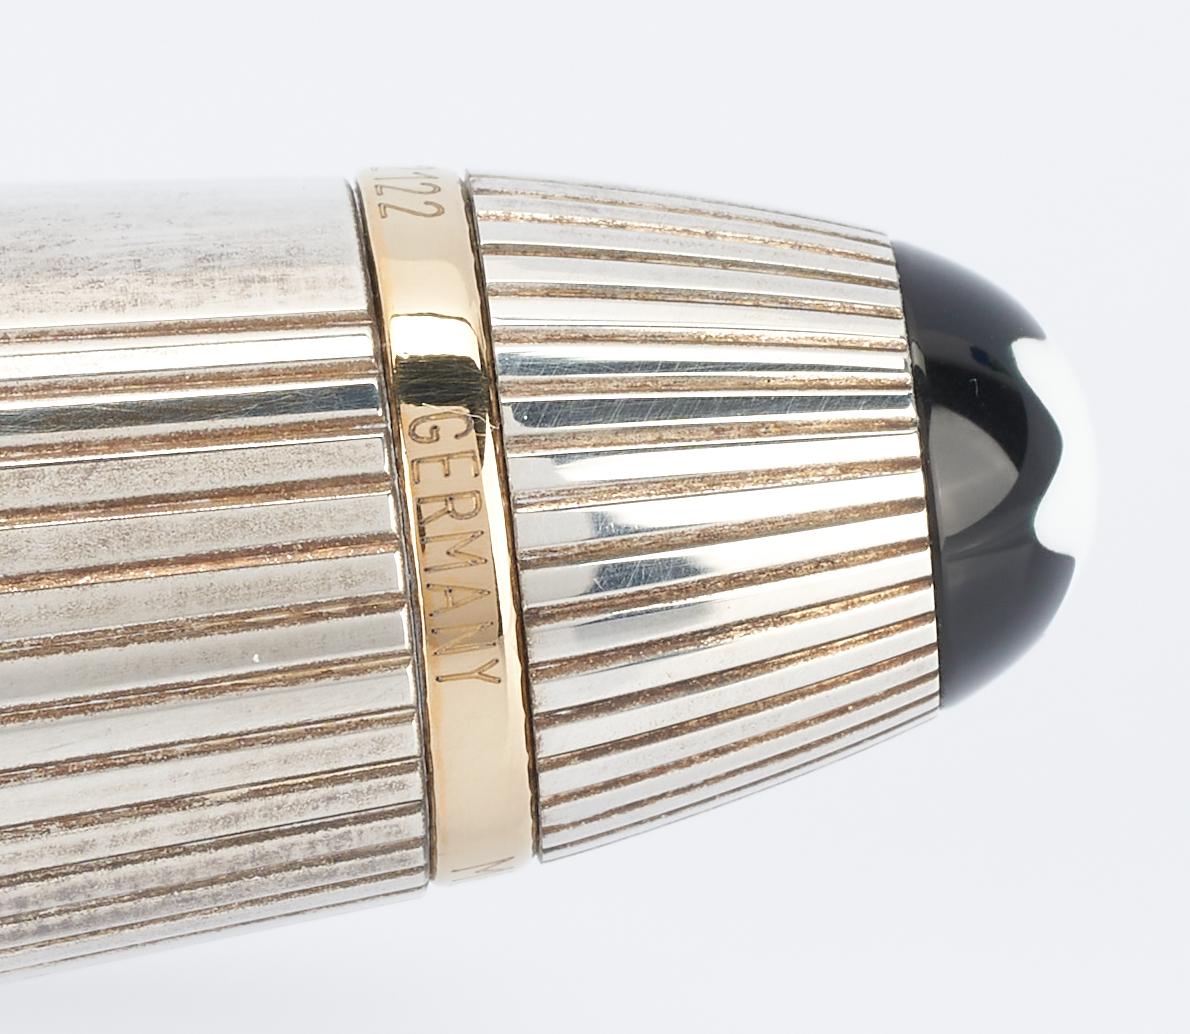 Lot 51: 4 Designer Pens, incl. 2 Montblanc, Aurora, Waterman